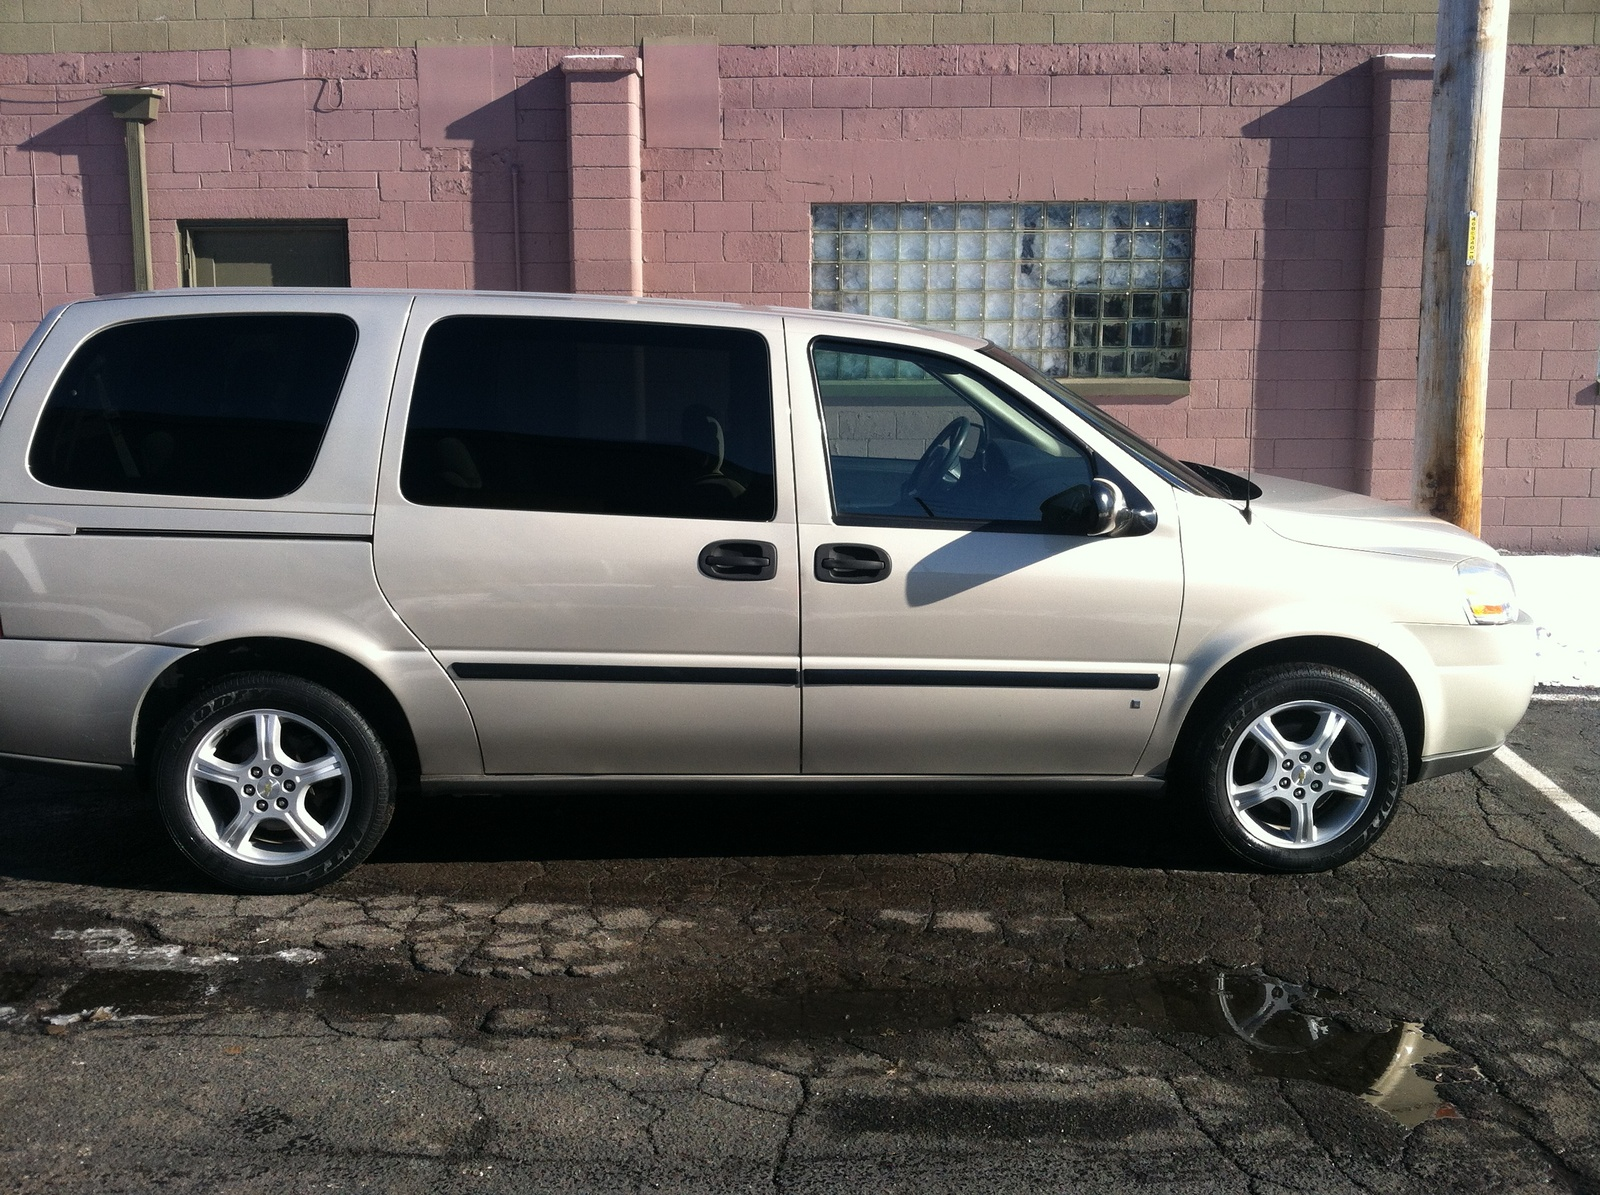 2007 Chevrolet Uplander - Pictures